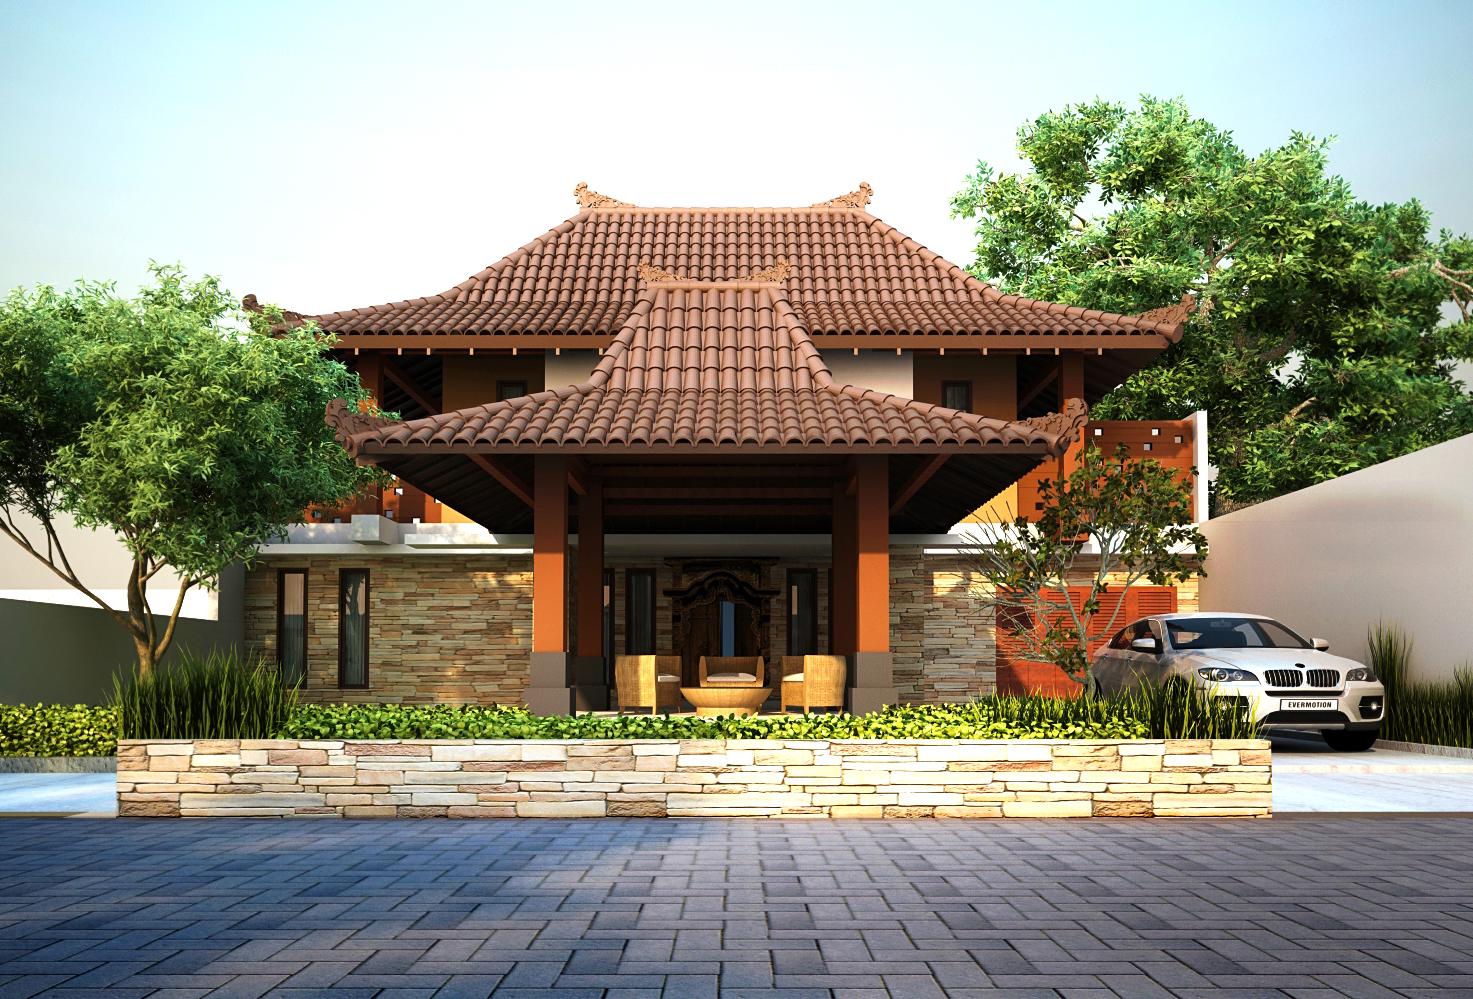 45 Desain Rumah Joglo Khas Jawa Tengah  Desainrumahnya.com